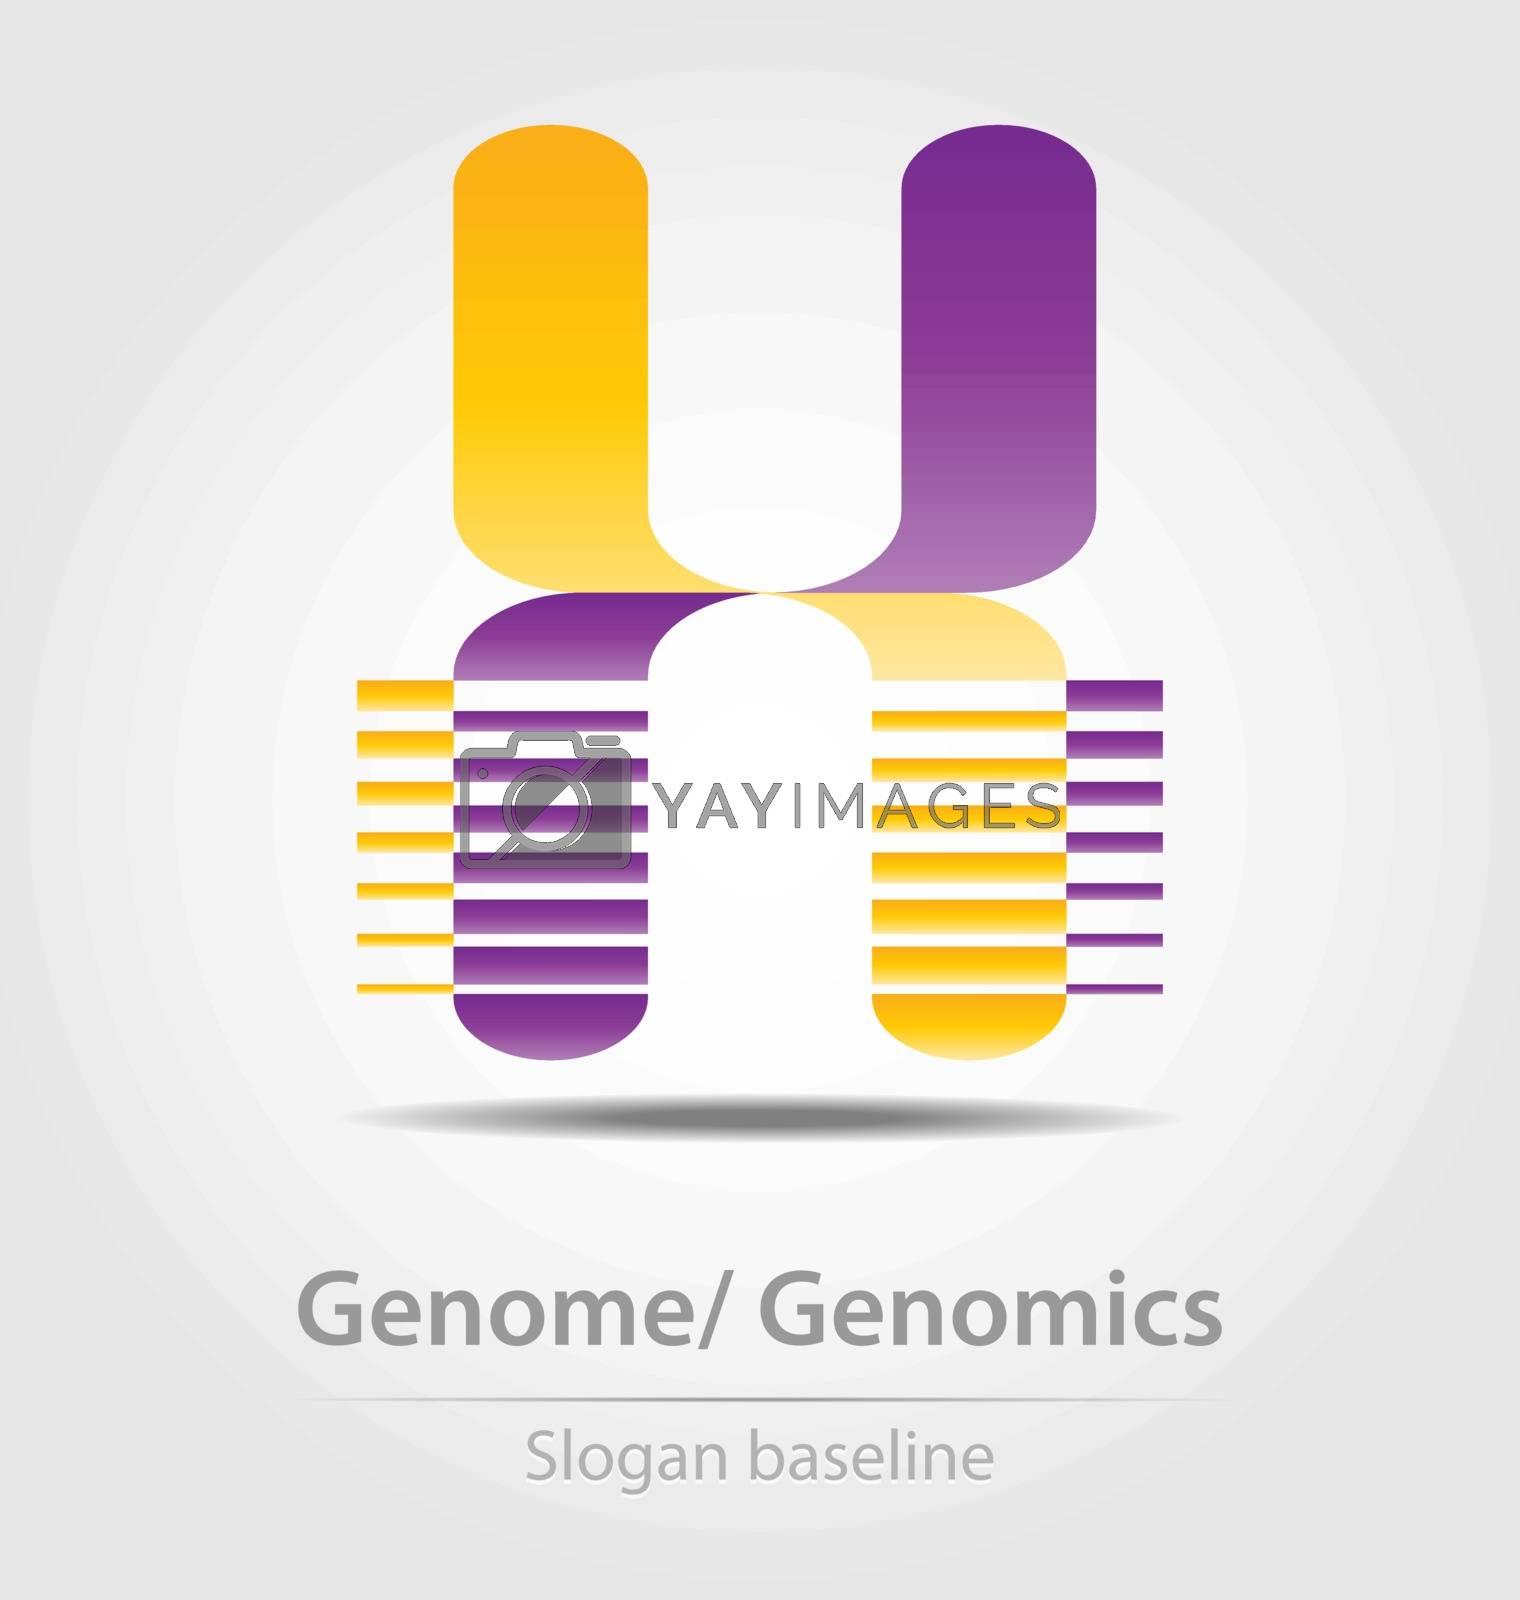 Genome analysis,genomics business icon for creative design